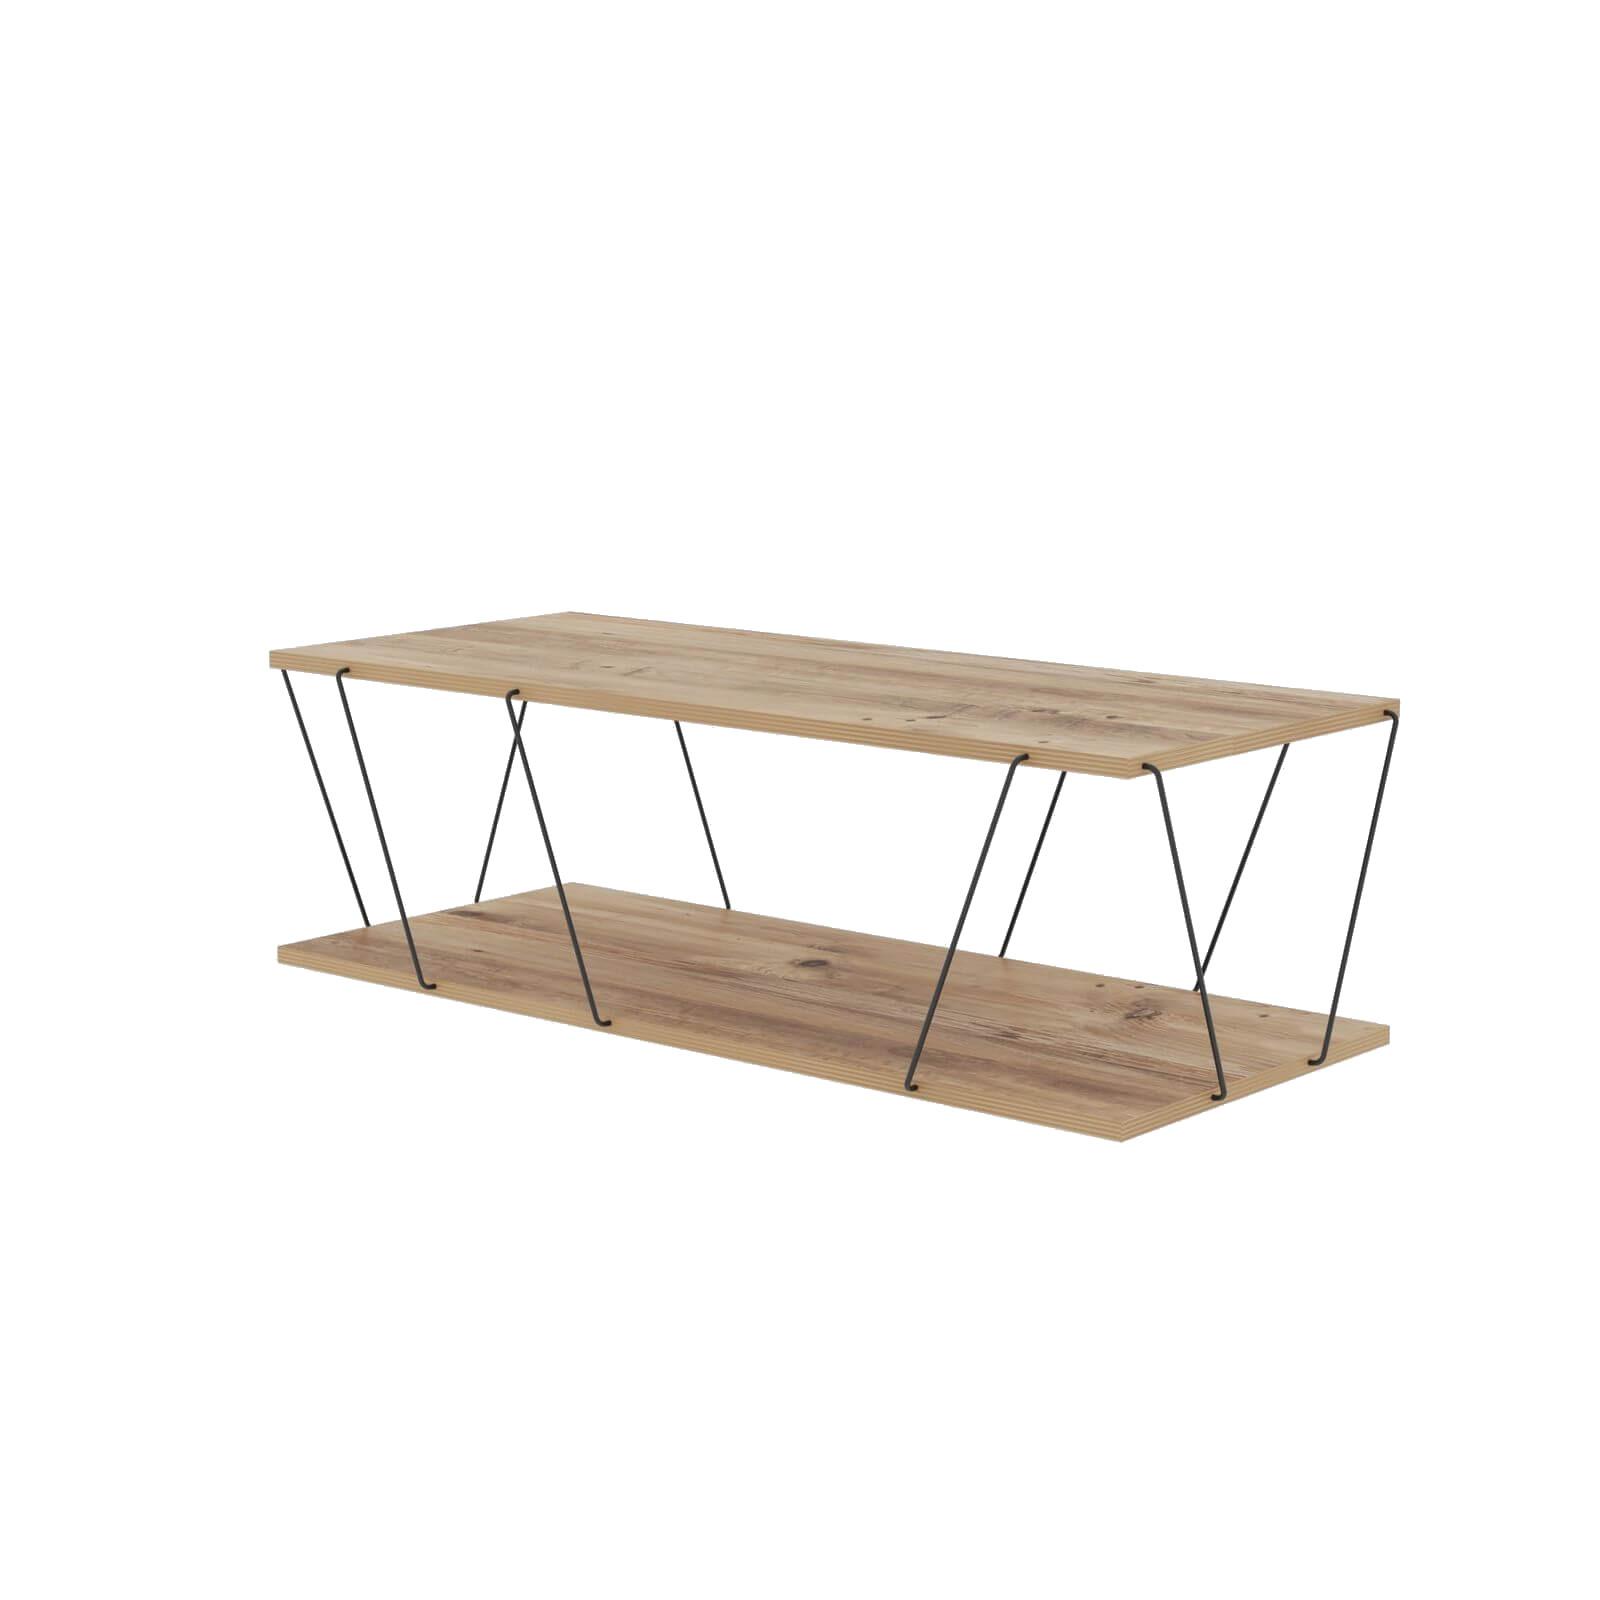 Table basse 120 cm SANA Bois/ Noir